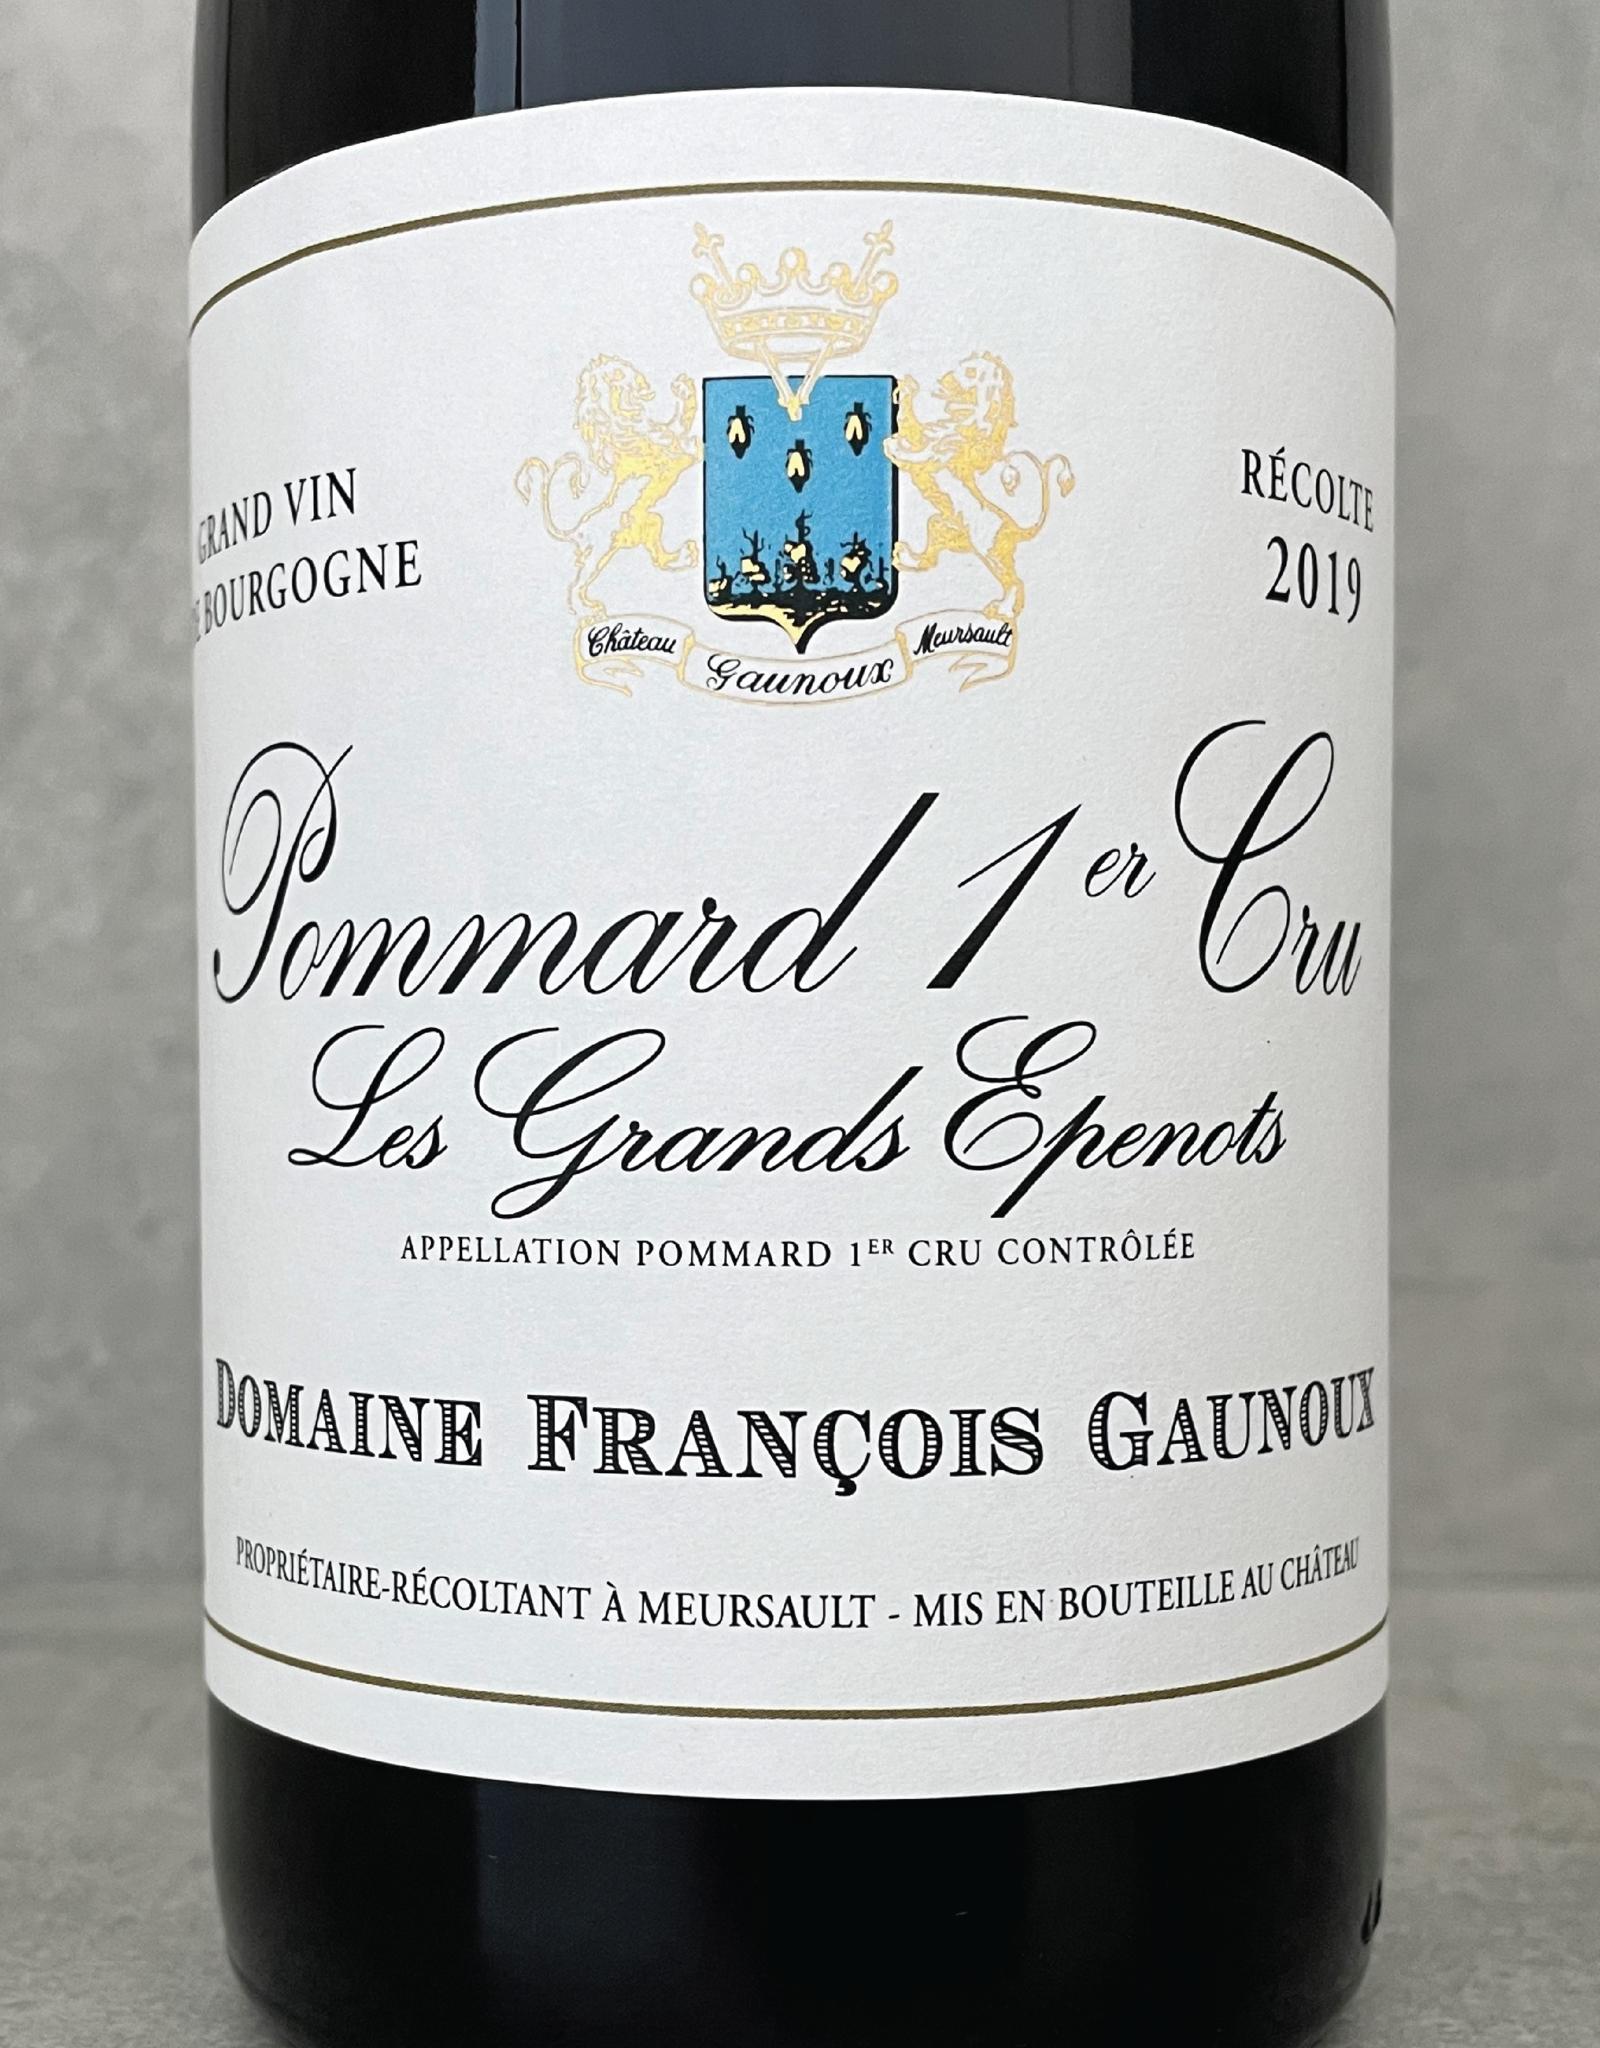 François Gaunoux Pommard 1er Cru Grands Epenots 2000